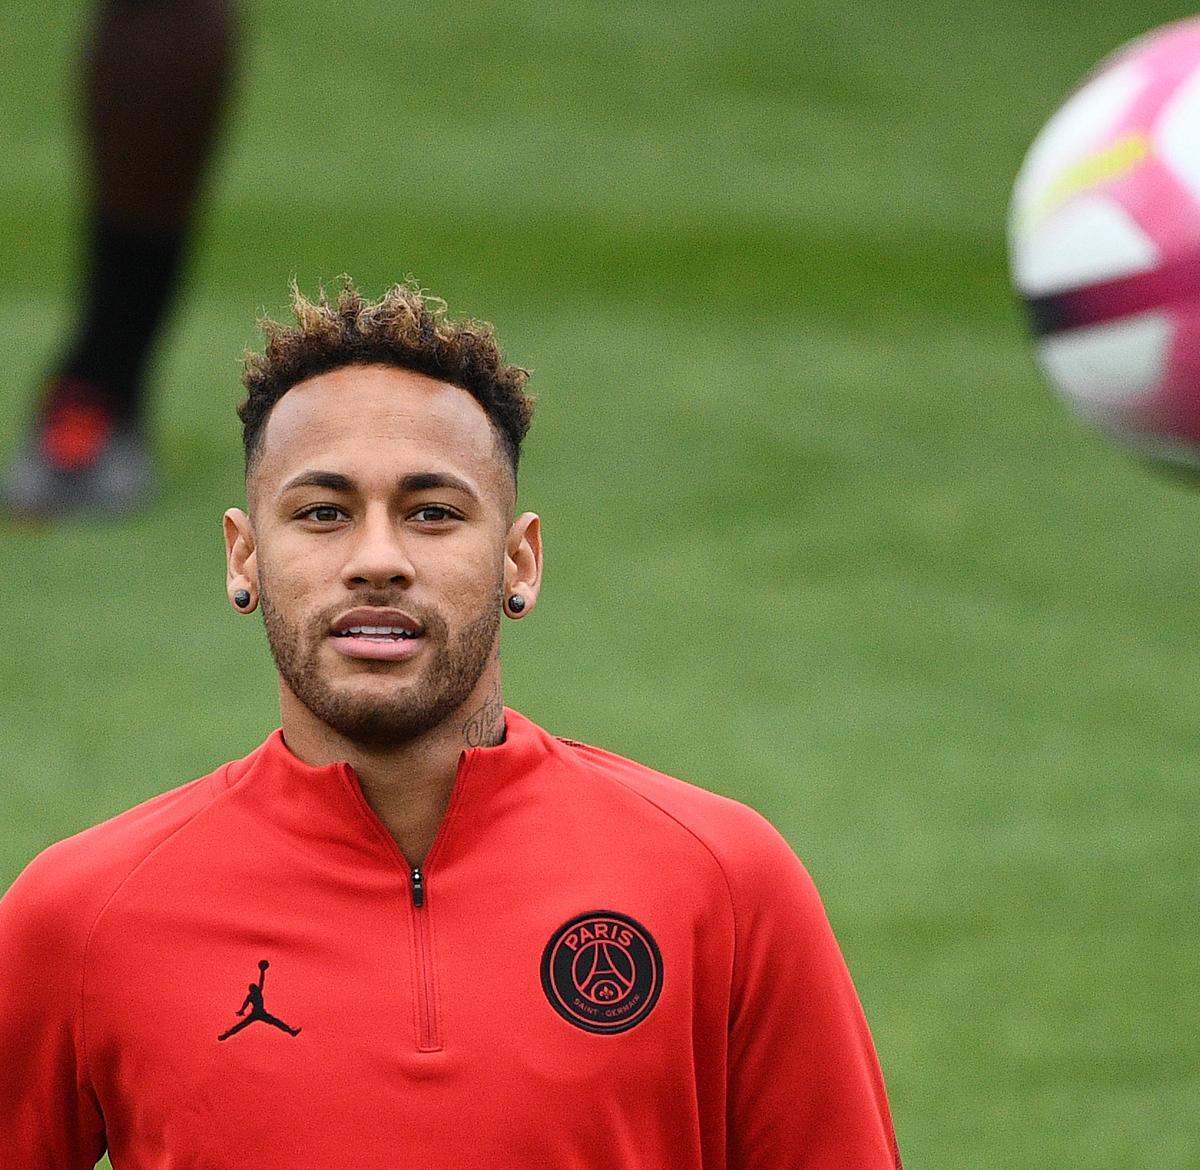 PSG Chairman Nasser Al-Khelaifi Talks 'Frustrating' Real Madrid, Neymar Links